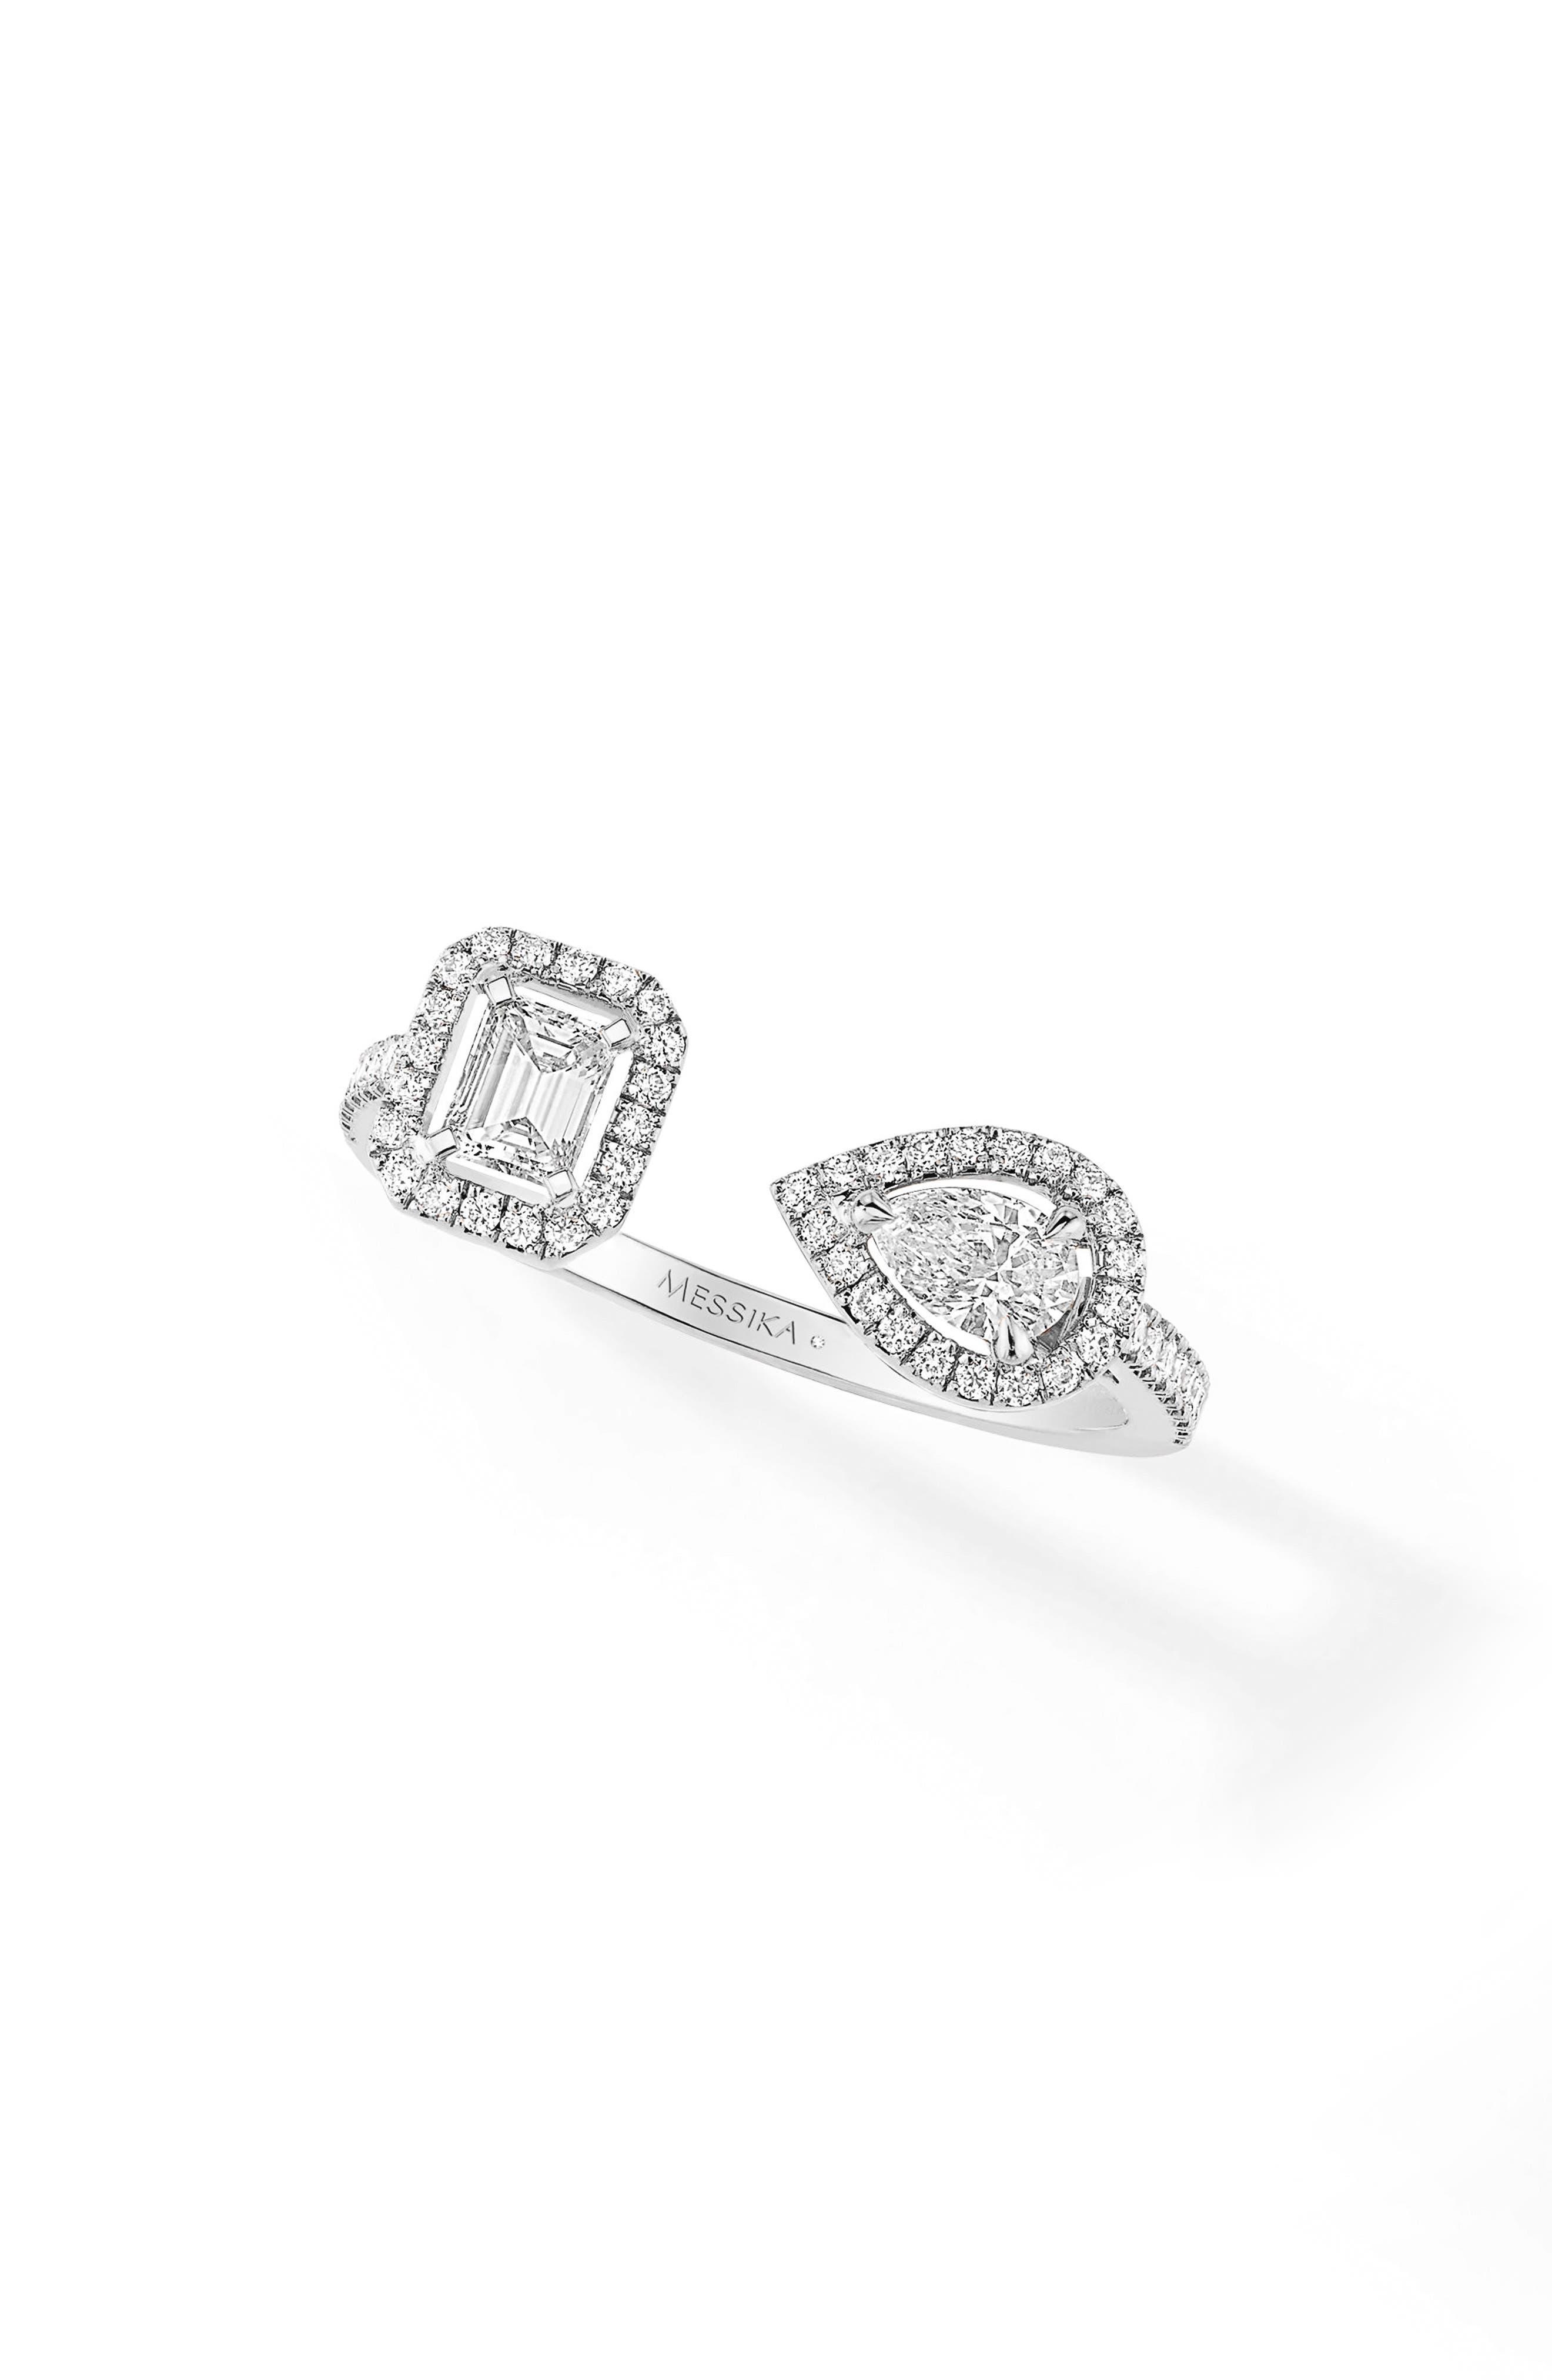 Main Image - Messika My Twin Diamond Ring